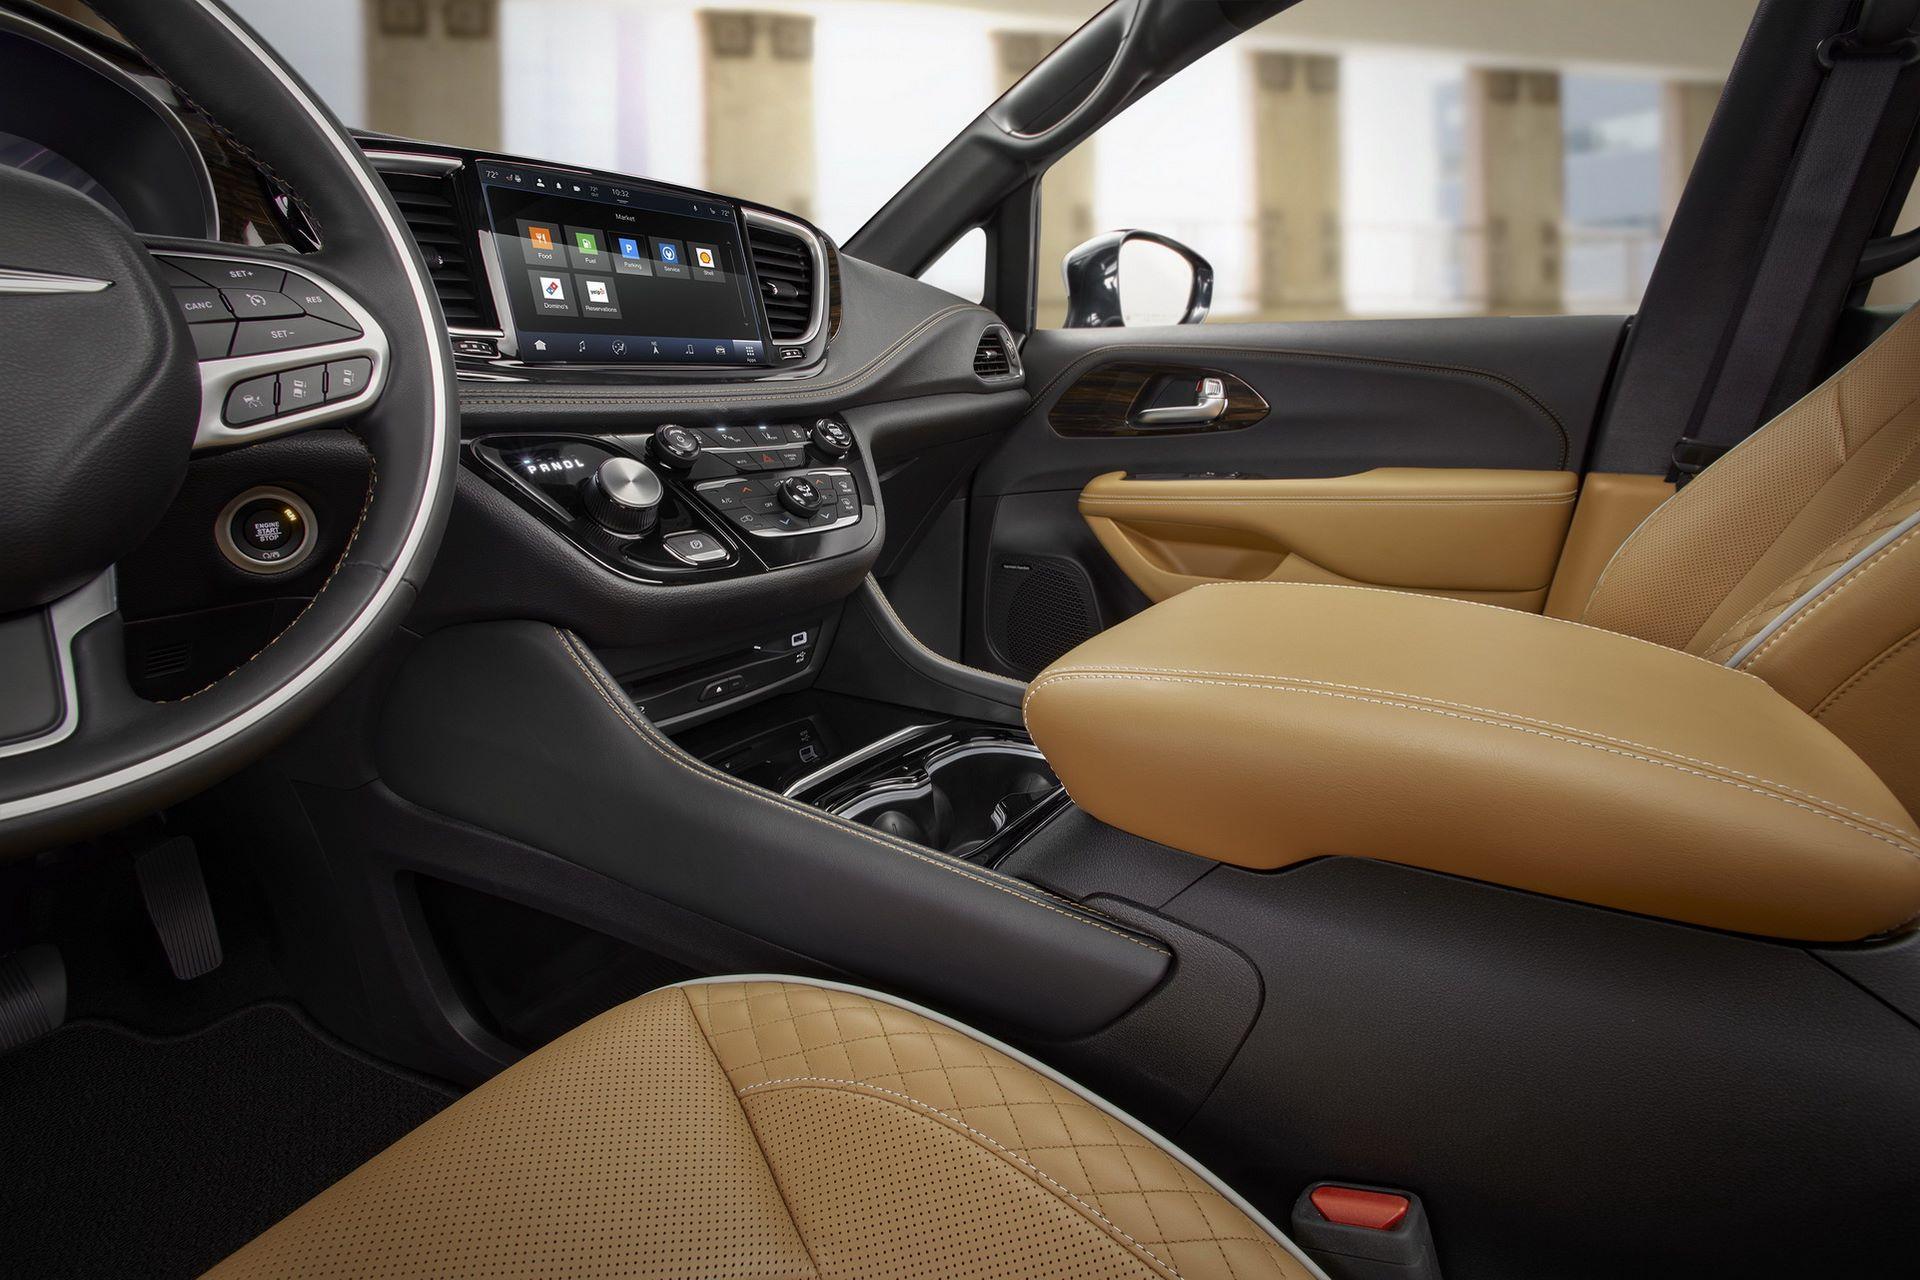 2021-Chrysler-Pacifica-70